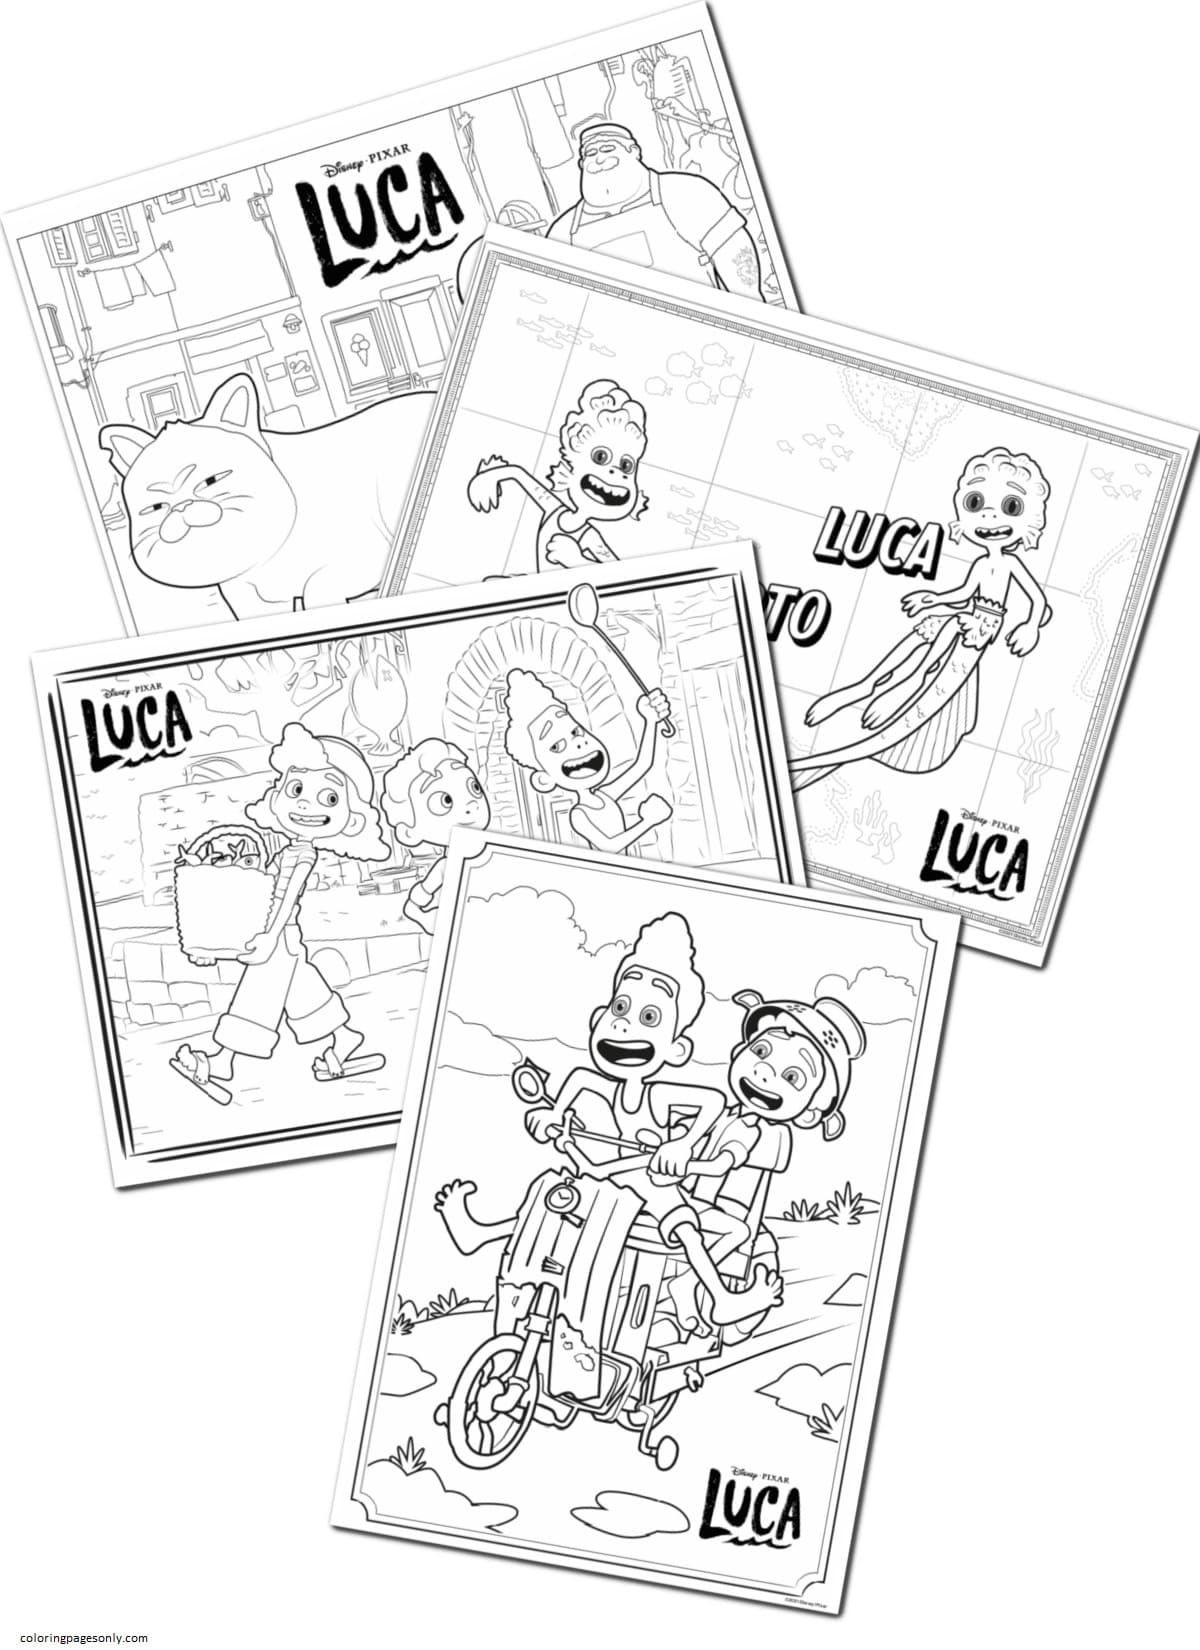 Disney Pixar Luca 1 Coloring Page